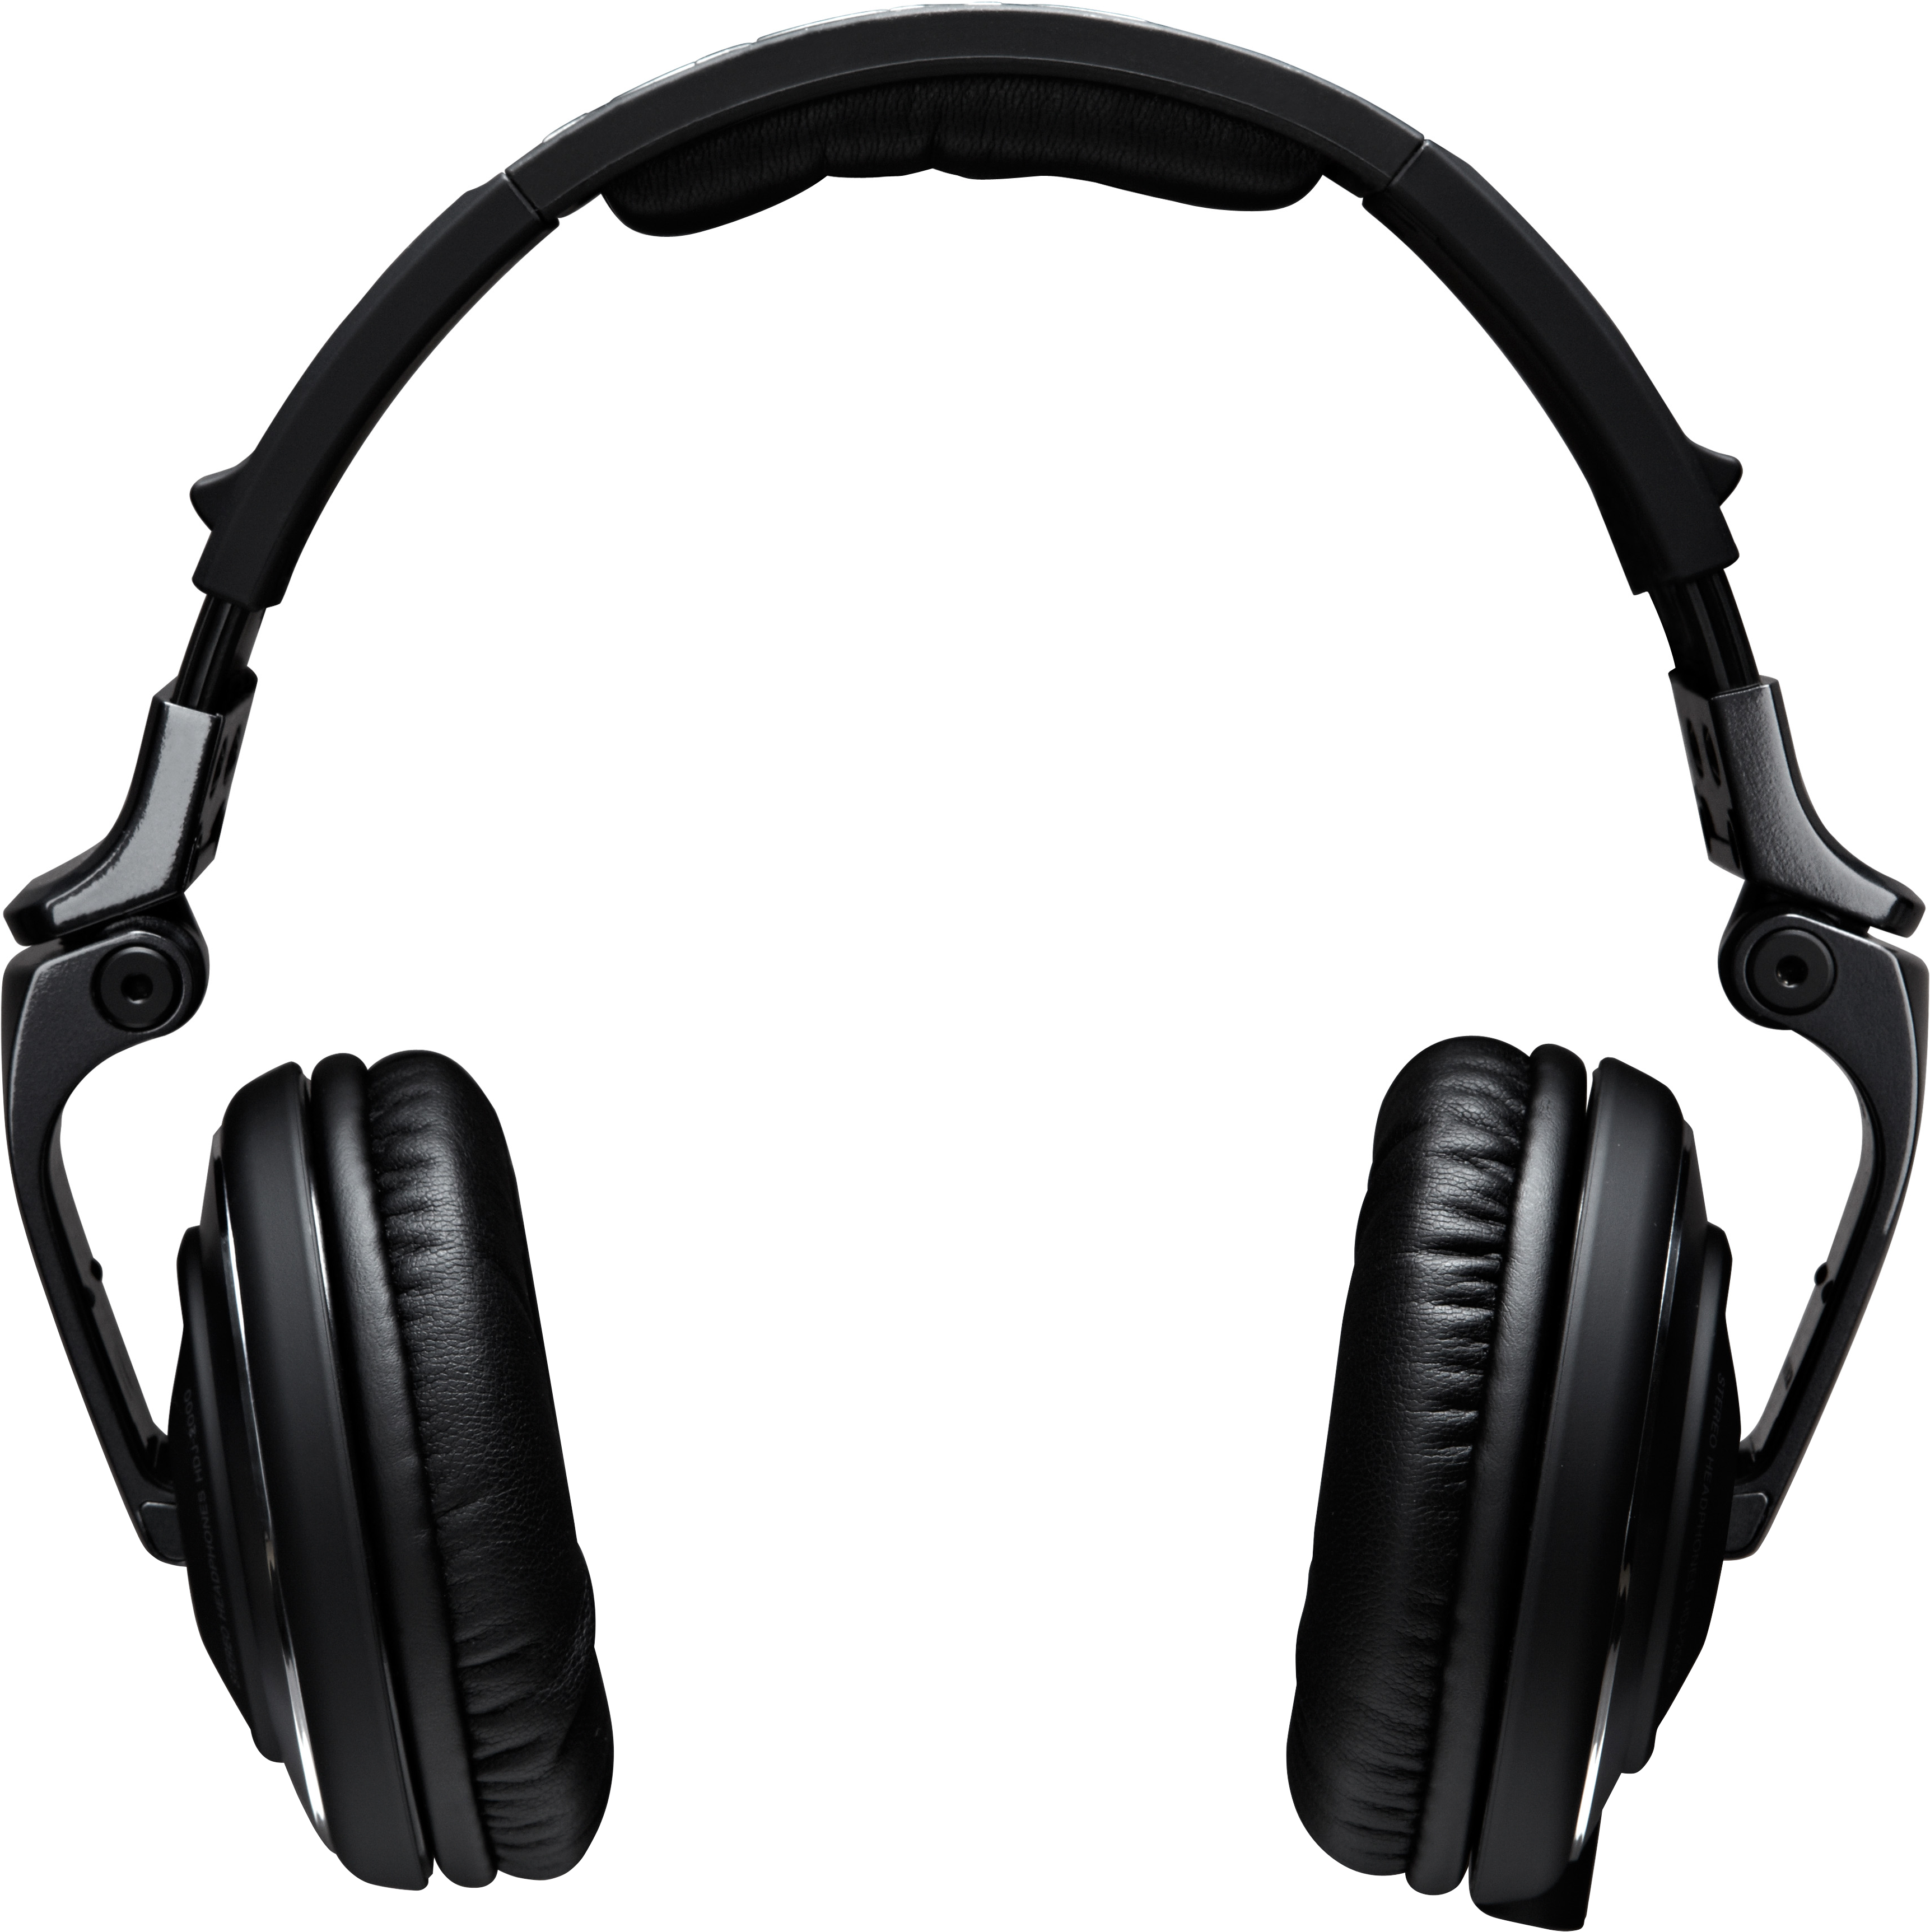 HDJ-2000